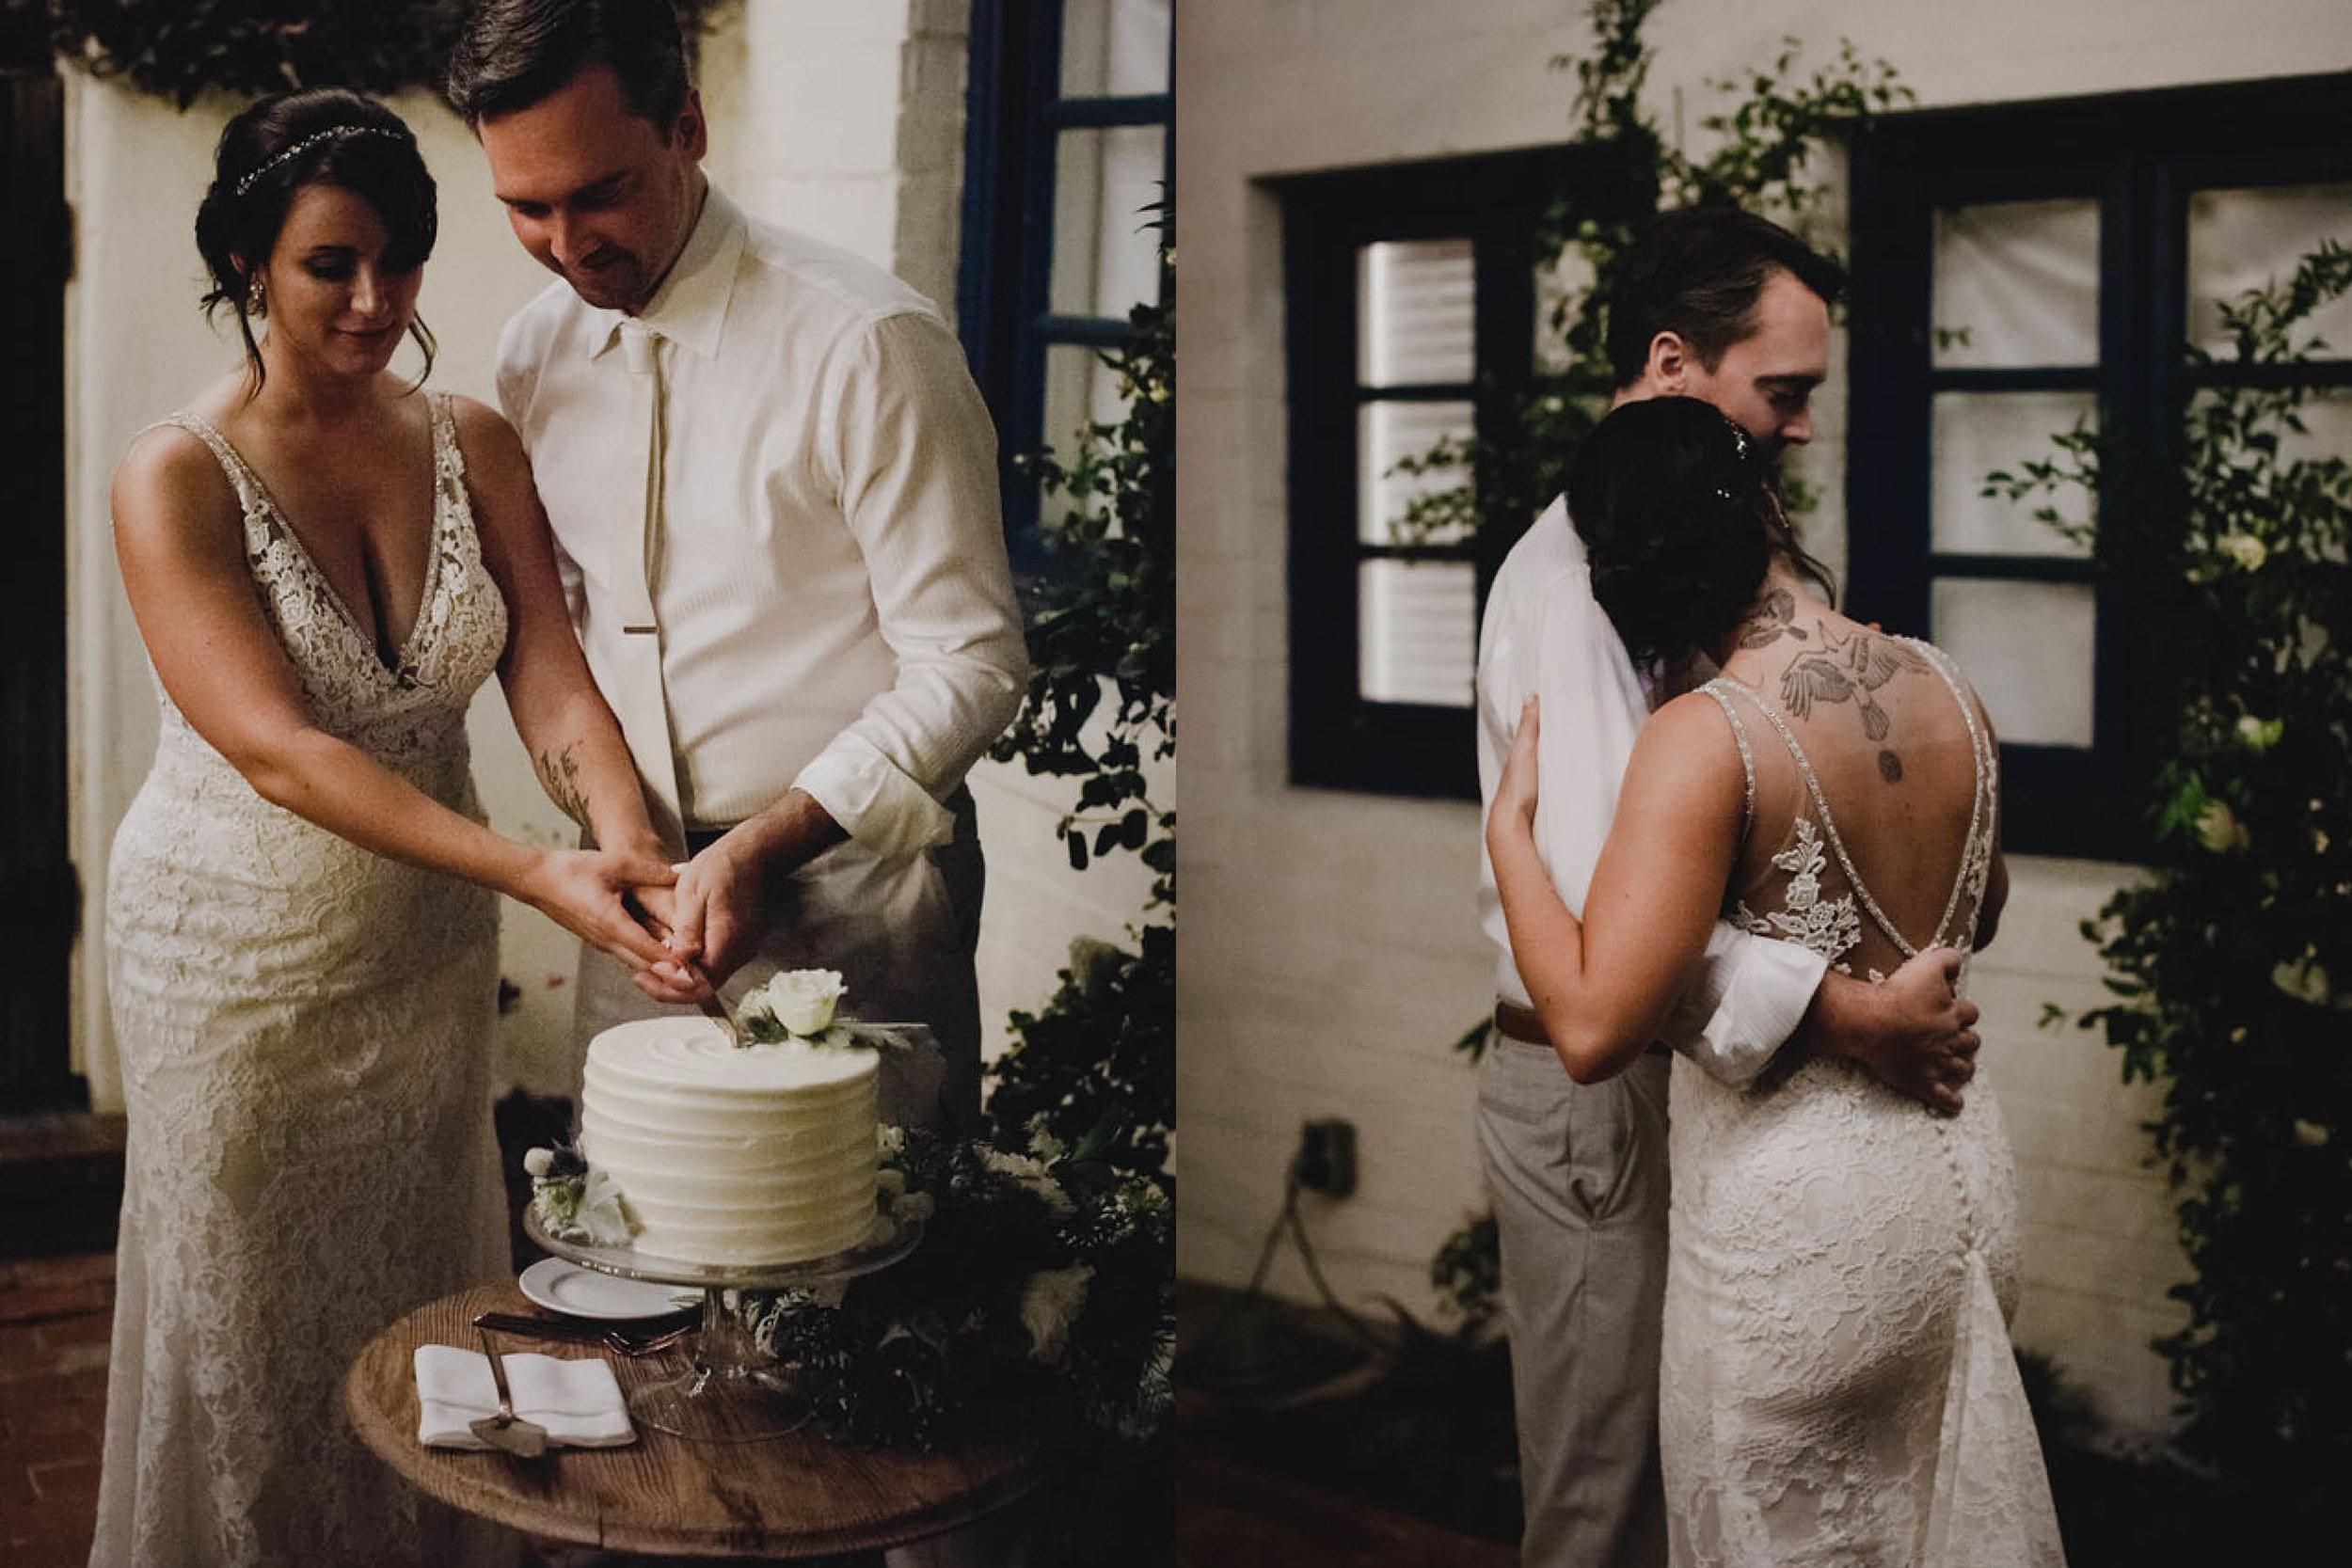 santa-barbara-elopement-wedding-planner-planning-coordination-day-of-coordinator-downtown-garden-oasis-float-spa-fountain-blue-white-event-design-vintage-china (36).jpg